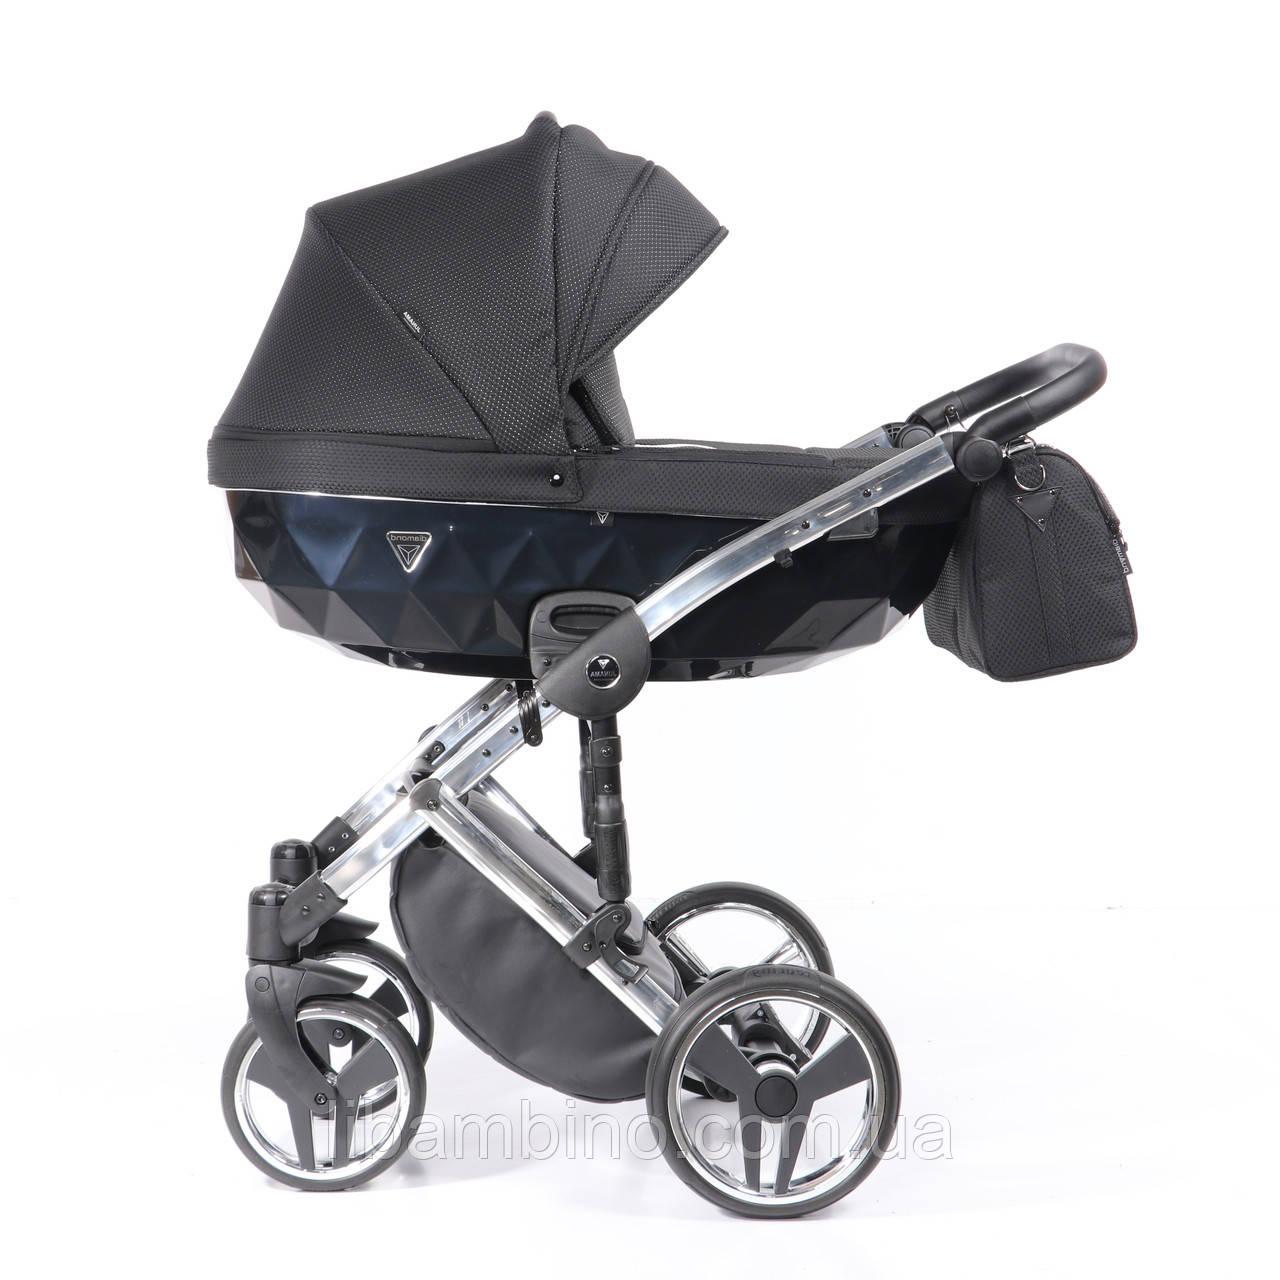 Дитяча універсальна коляска 2 в 1 Junama Onyx 01